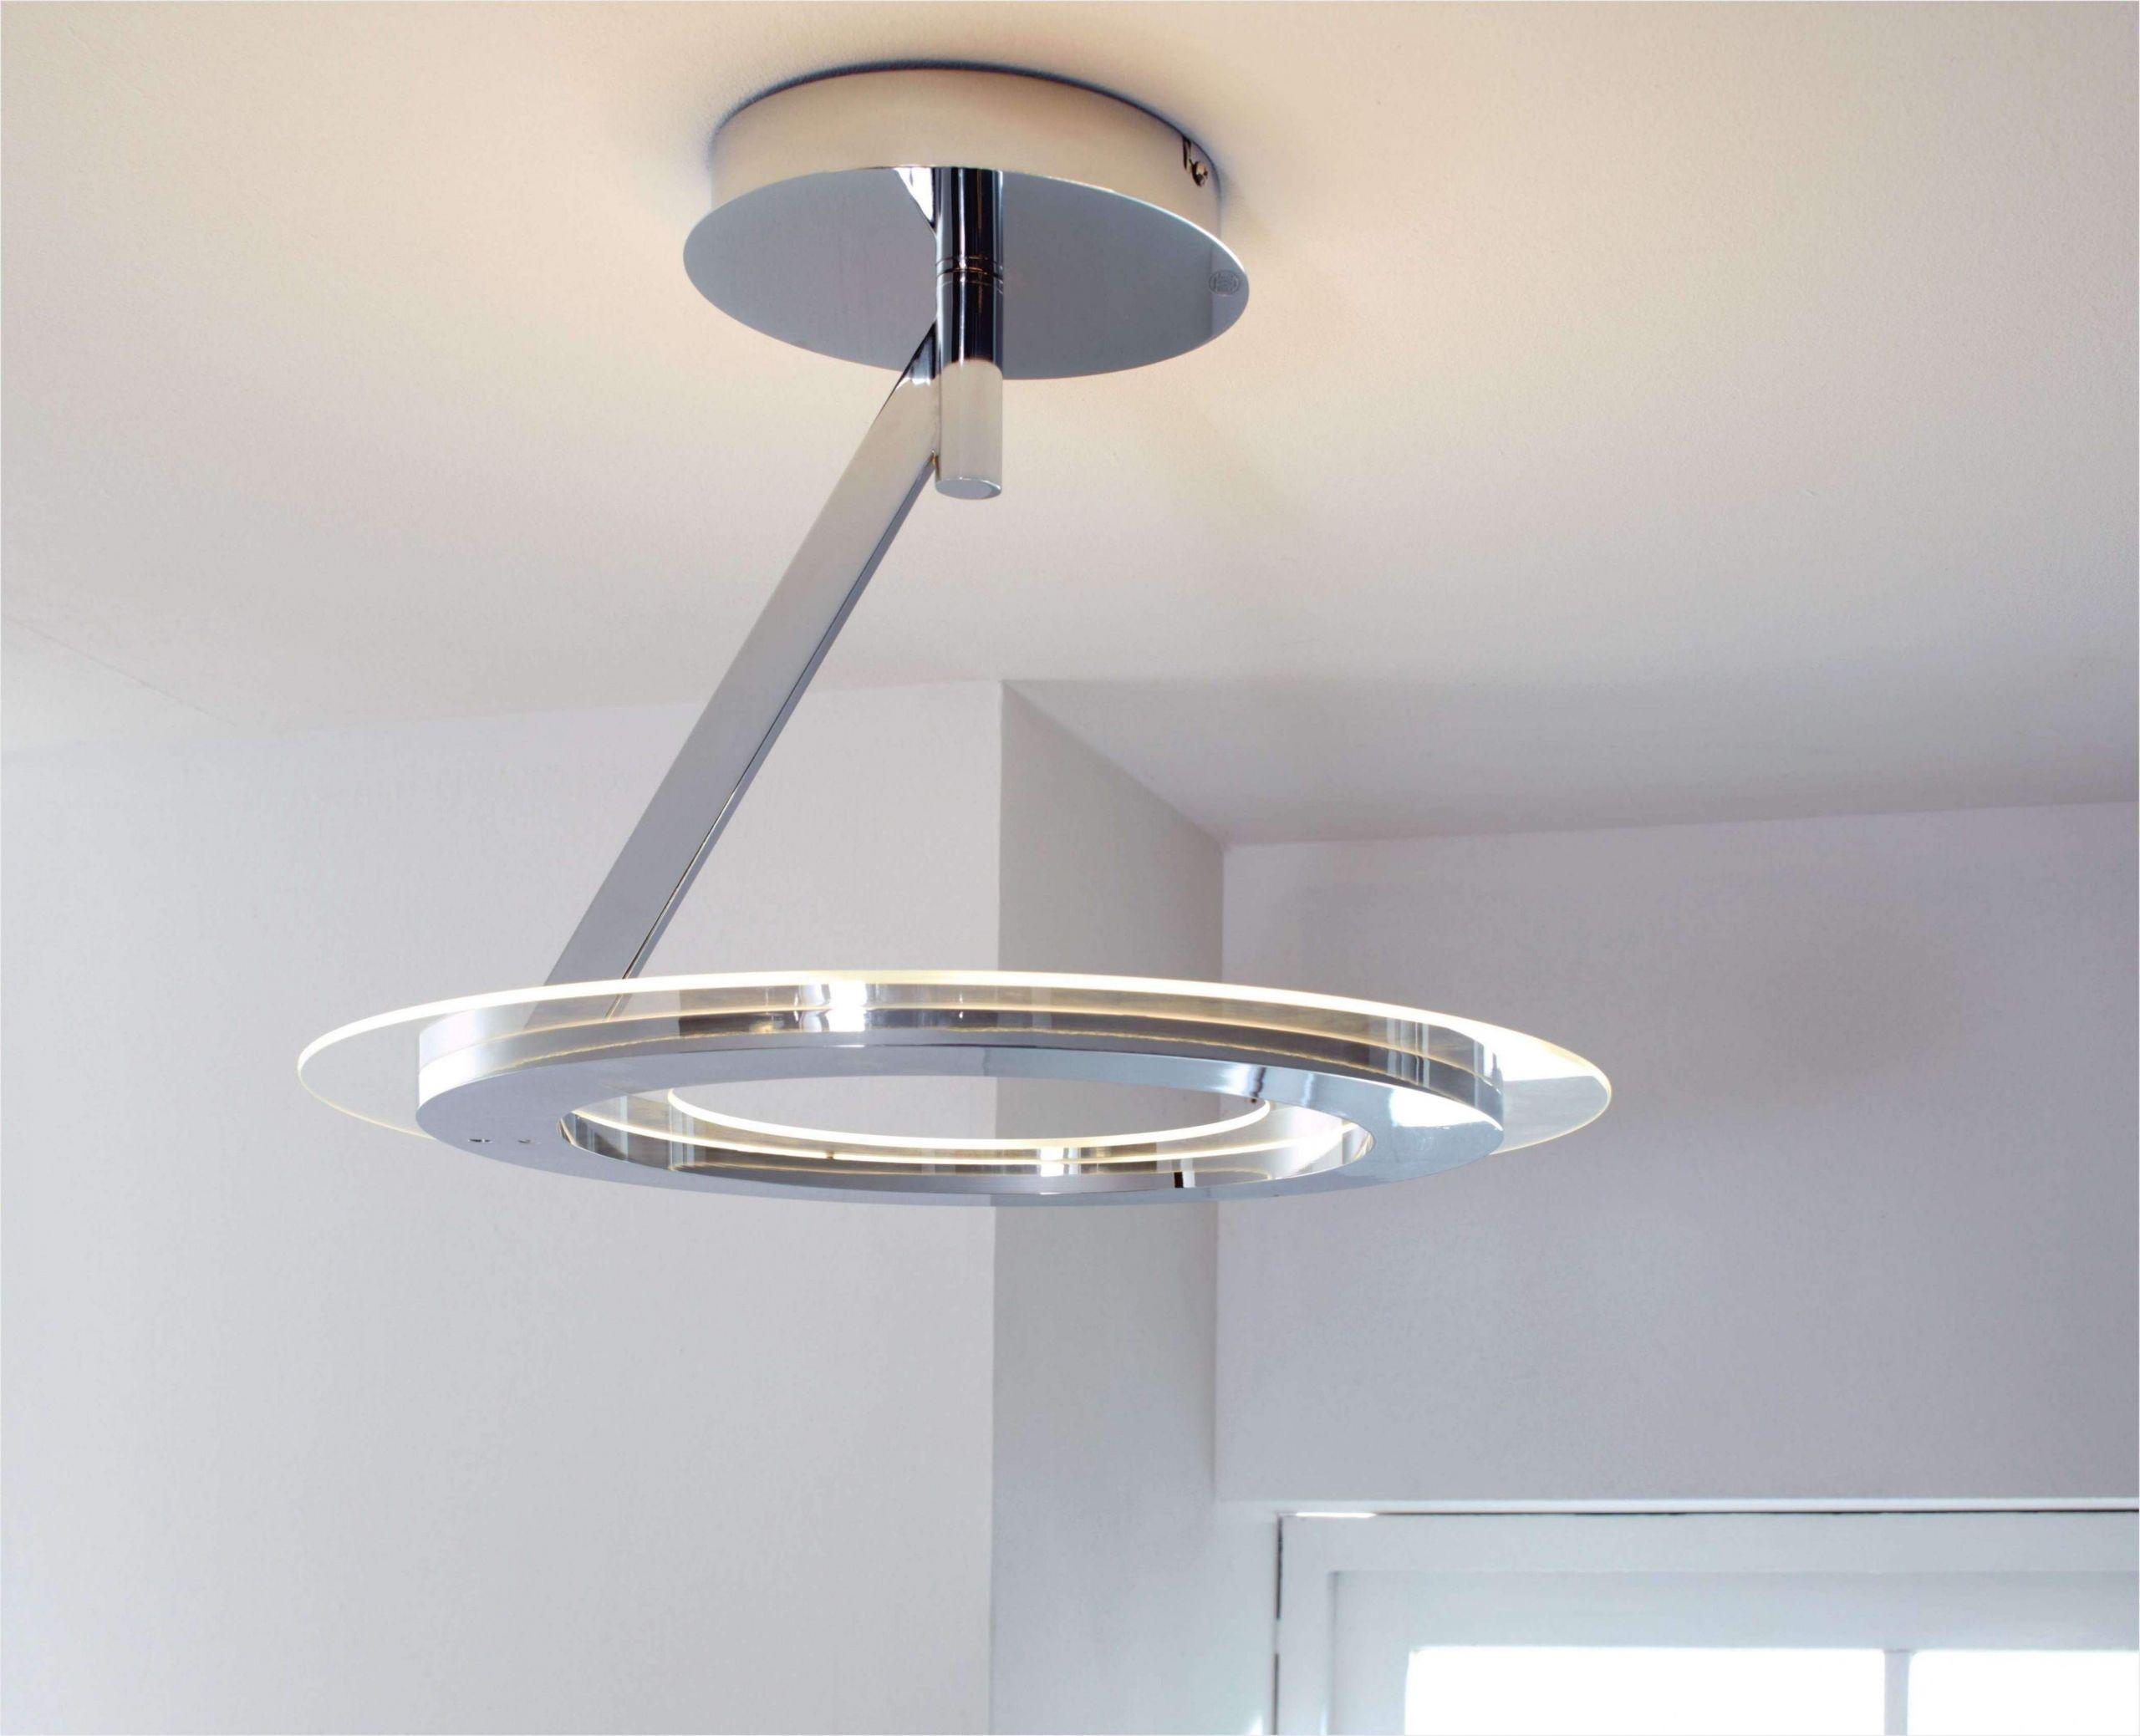 Full Size of Lampe Ventilateur Plafond Moderne Sur Pied Ikea Salon Bois A Poser Blanche Pour Pas Cher Modern De Wohnzimmer Grande Meuble Chambre Inspirierend Led Genial Wohnzimmer Lampe Modern